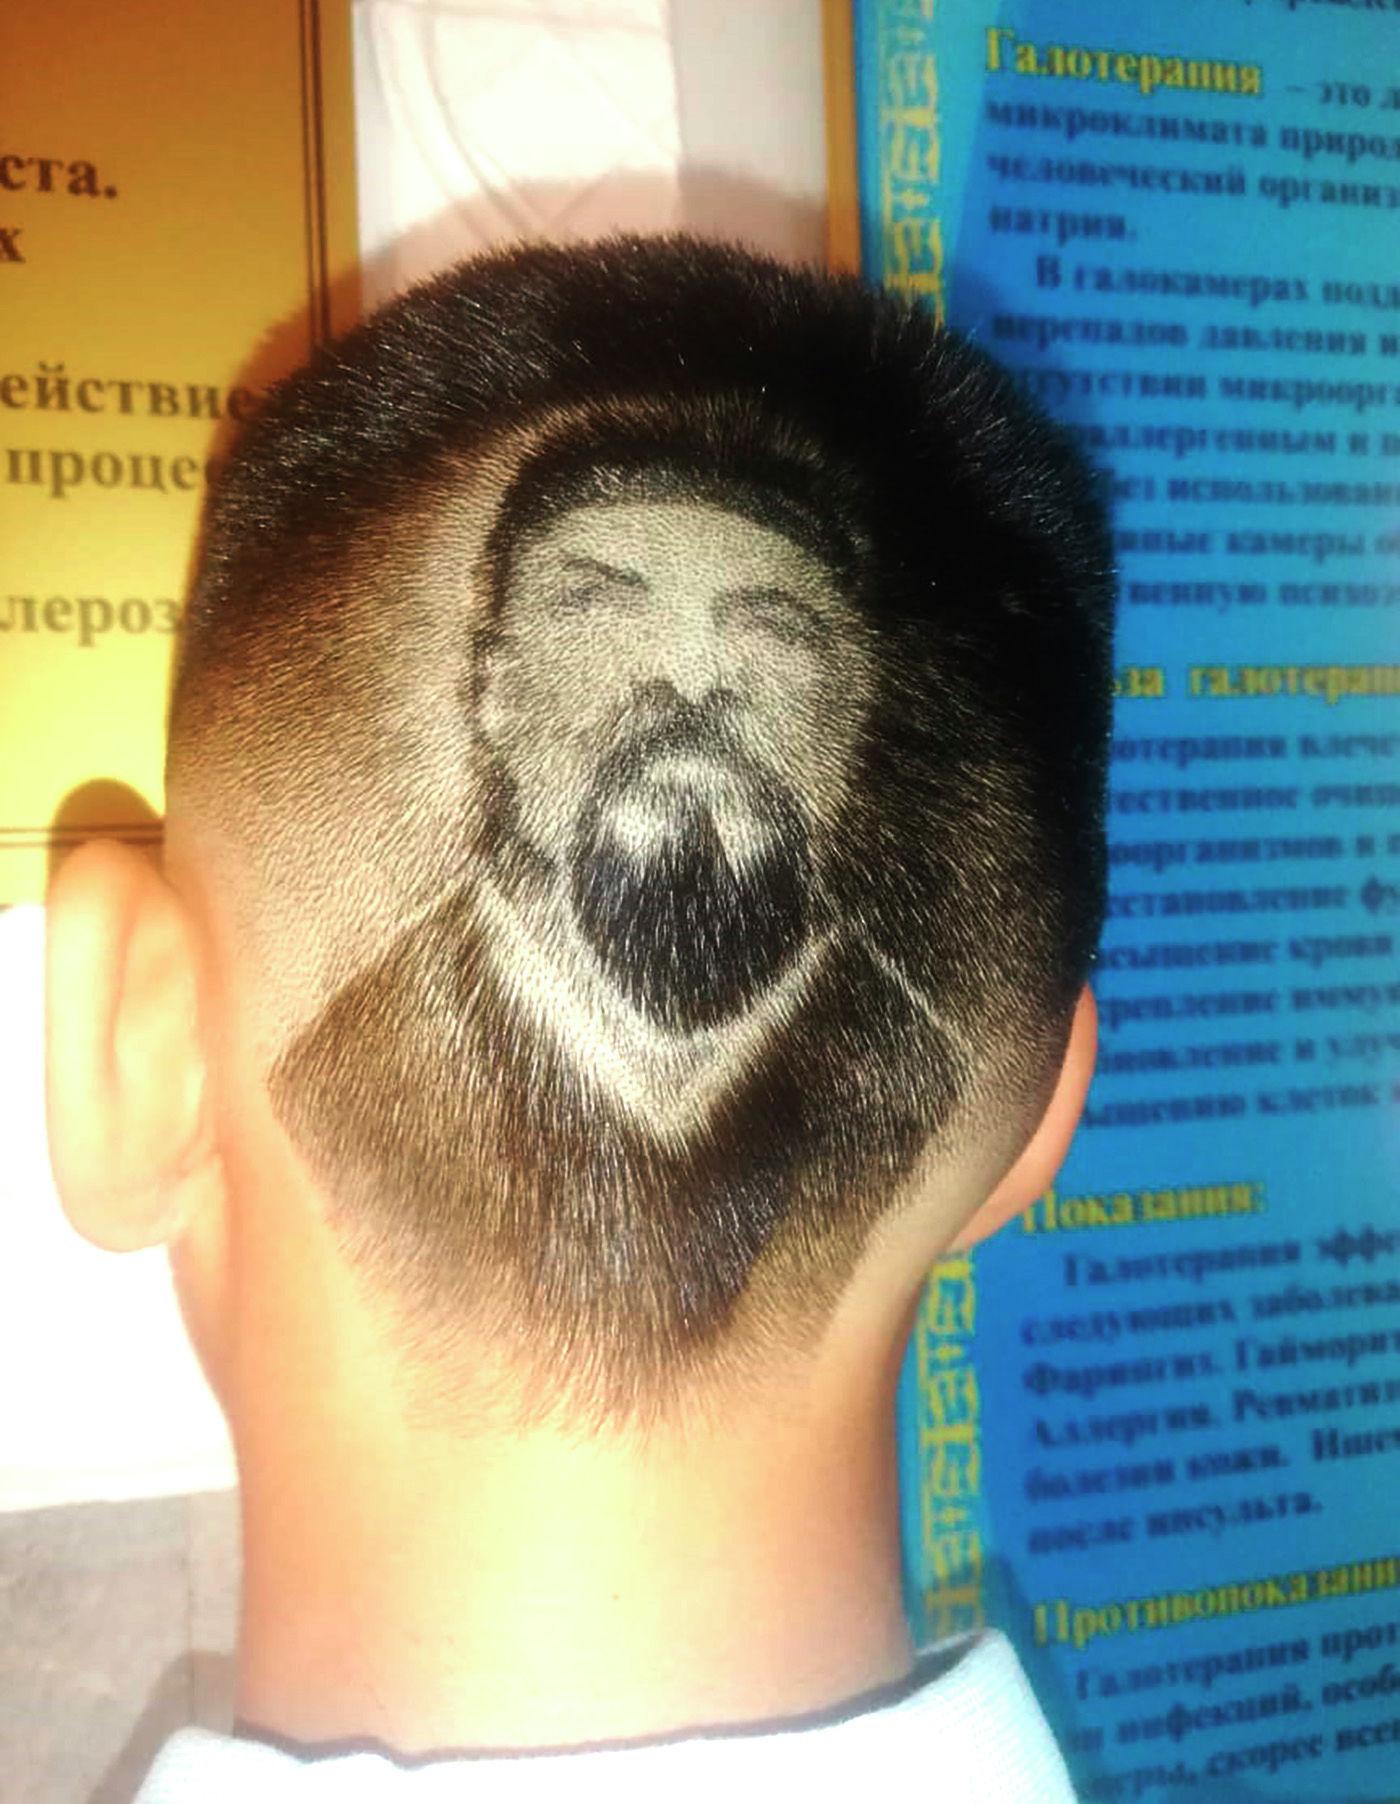 Семиклассник из Жаркента с креативной стрижкой